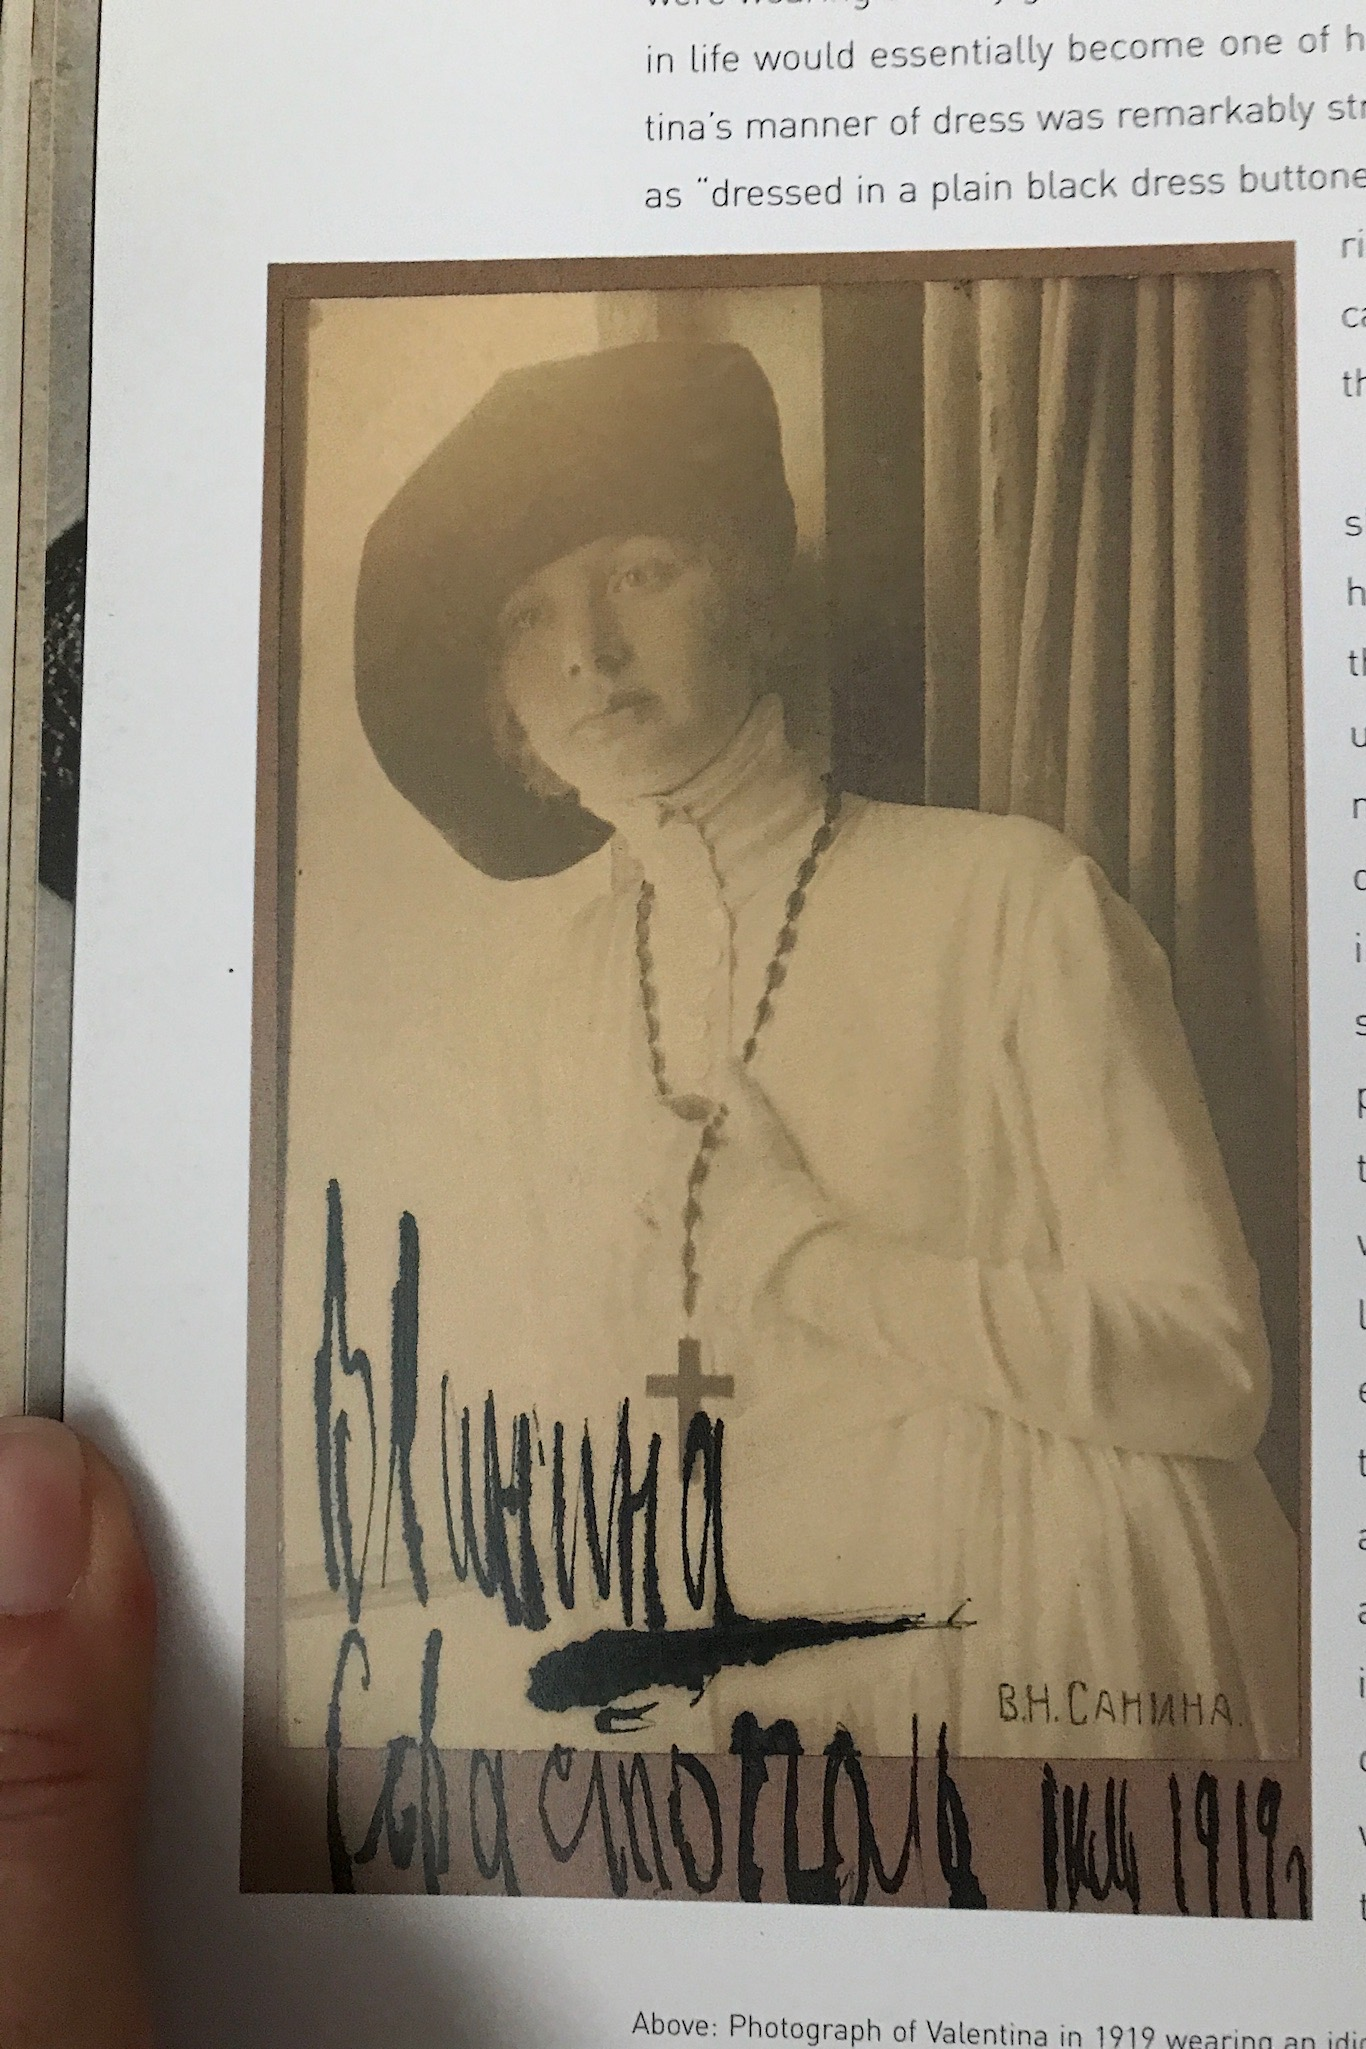 Valentina, 1919